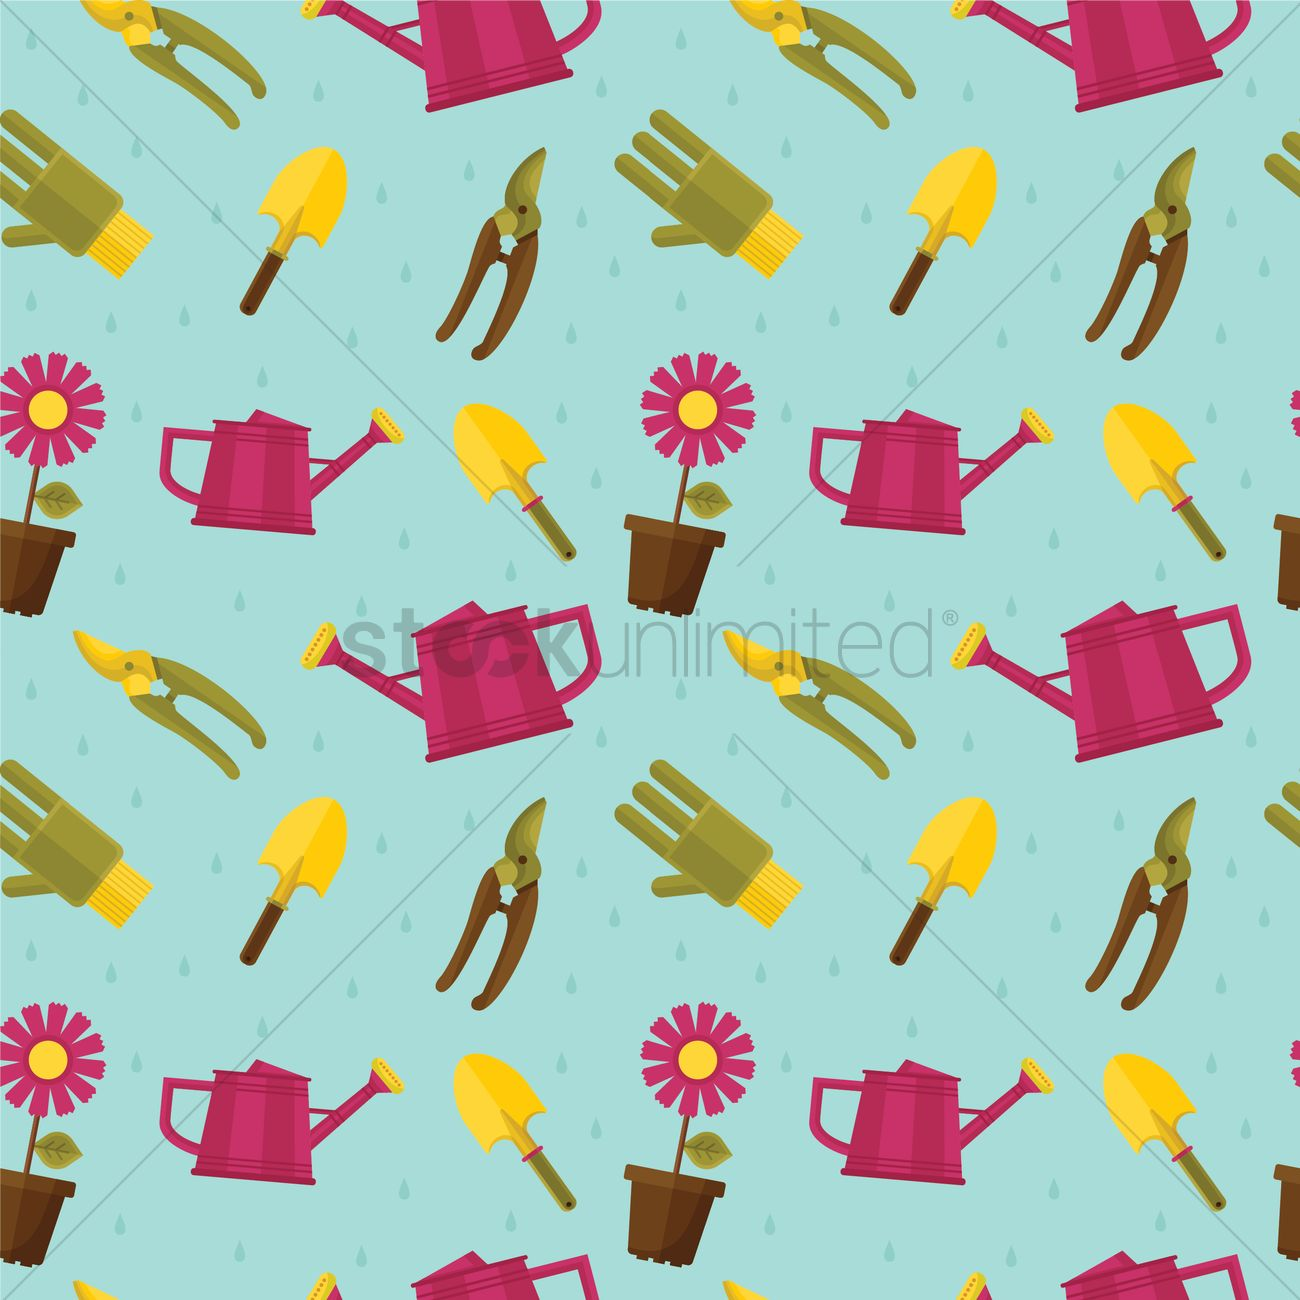 Wallpaper Of Gardening Items Vector Image 1243396 Stockunlimited